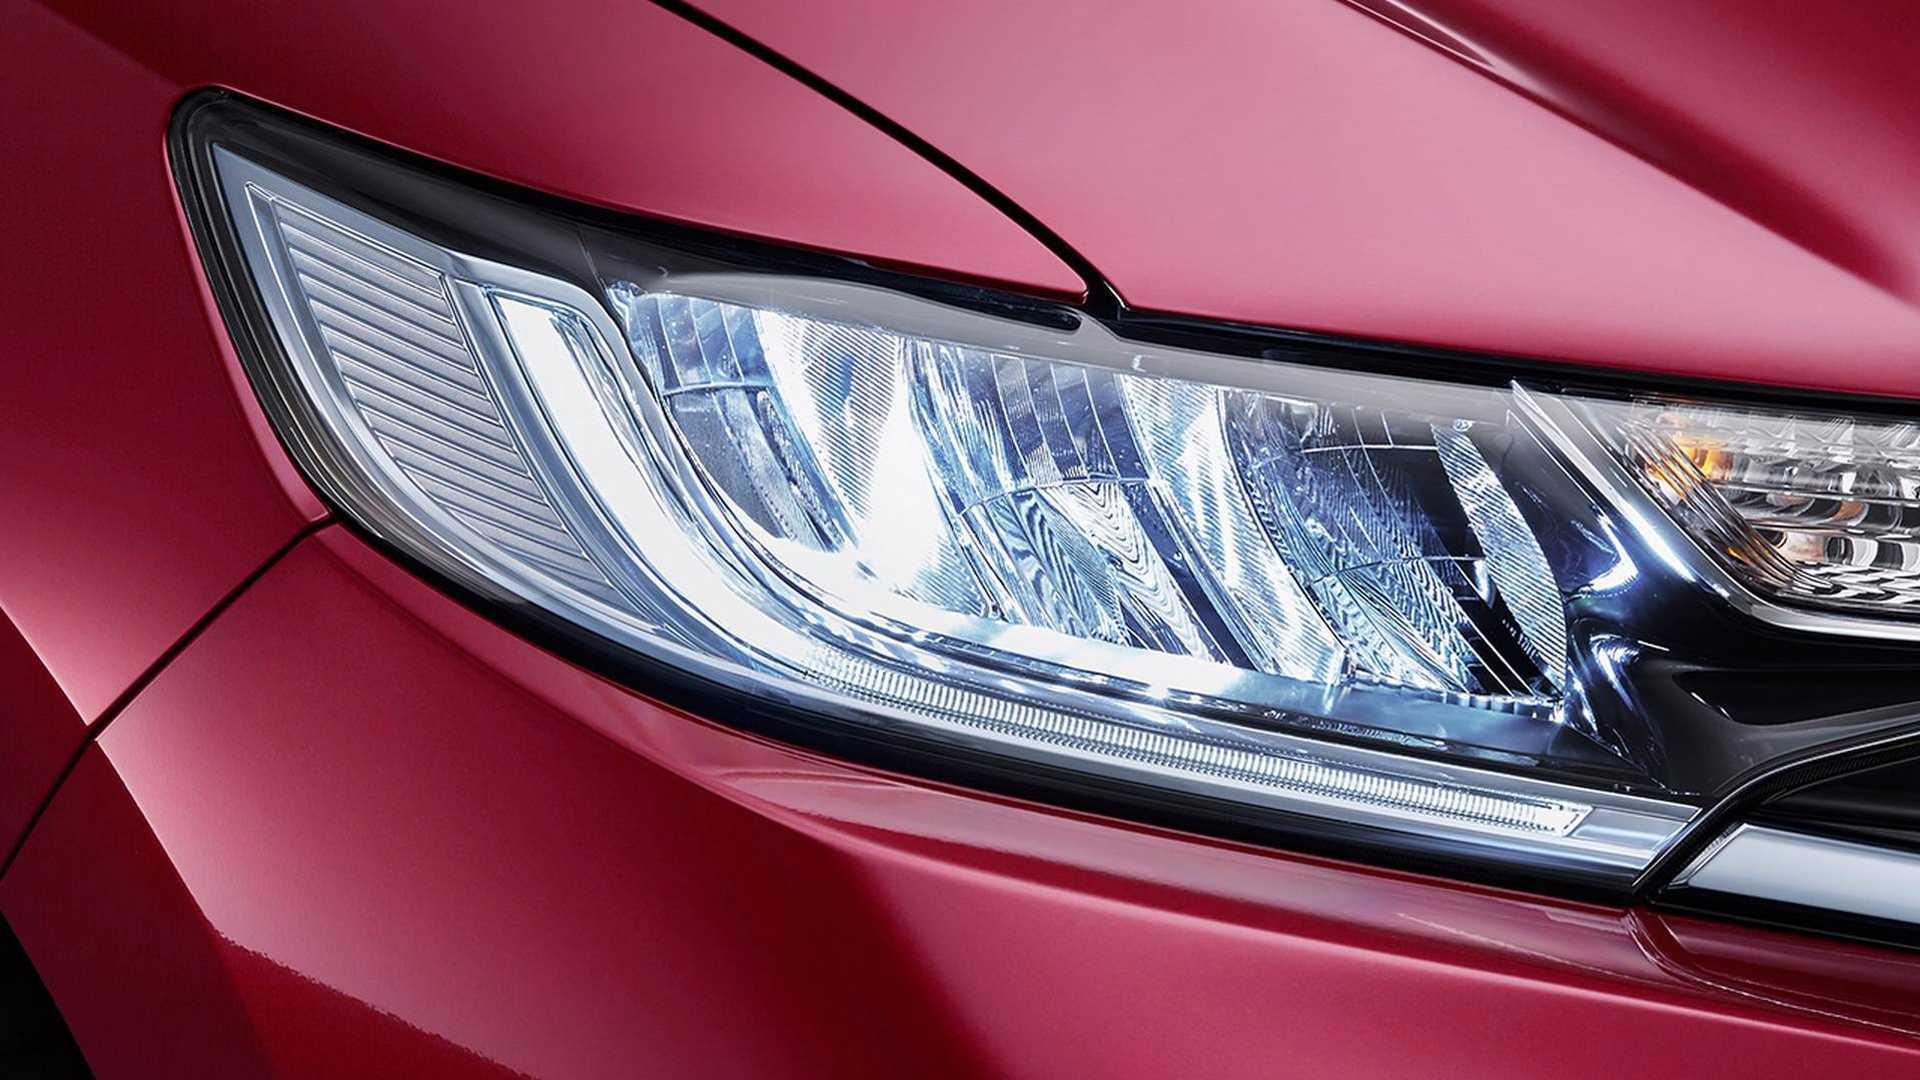 2018 Honda Fit Facelift Revealed By Japanese Microsite